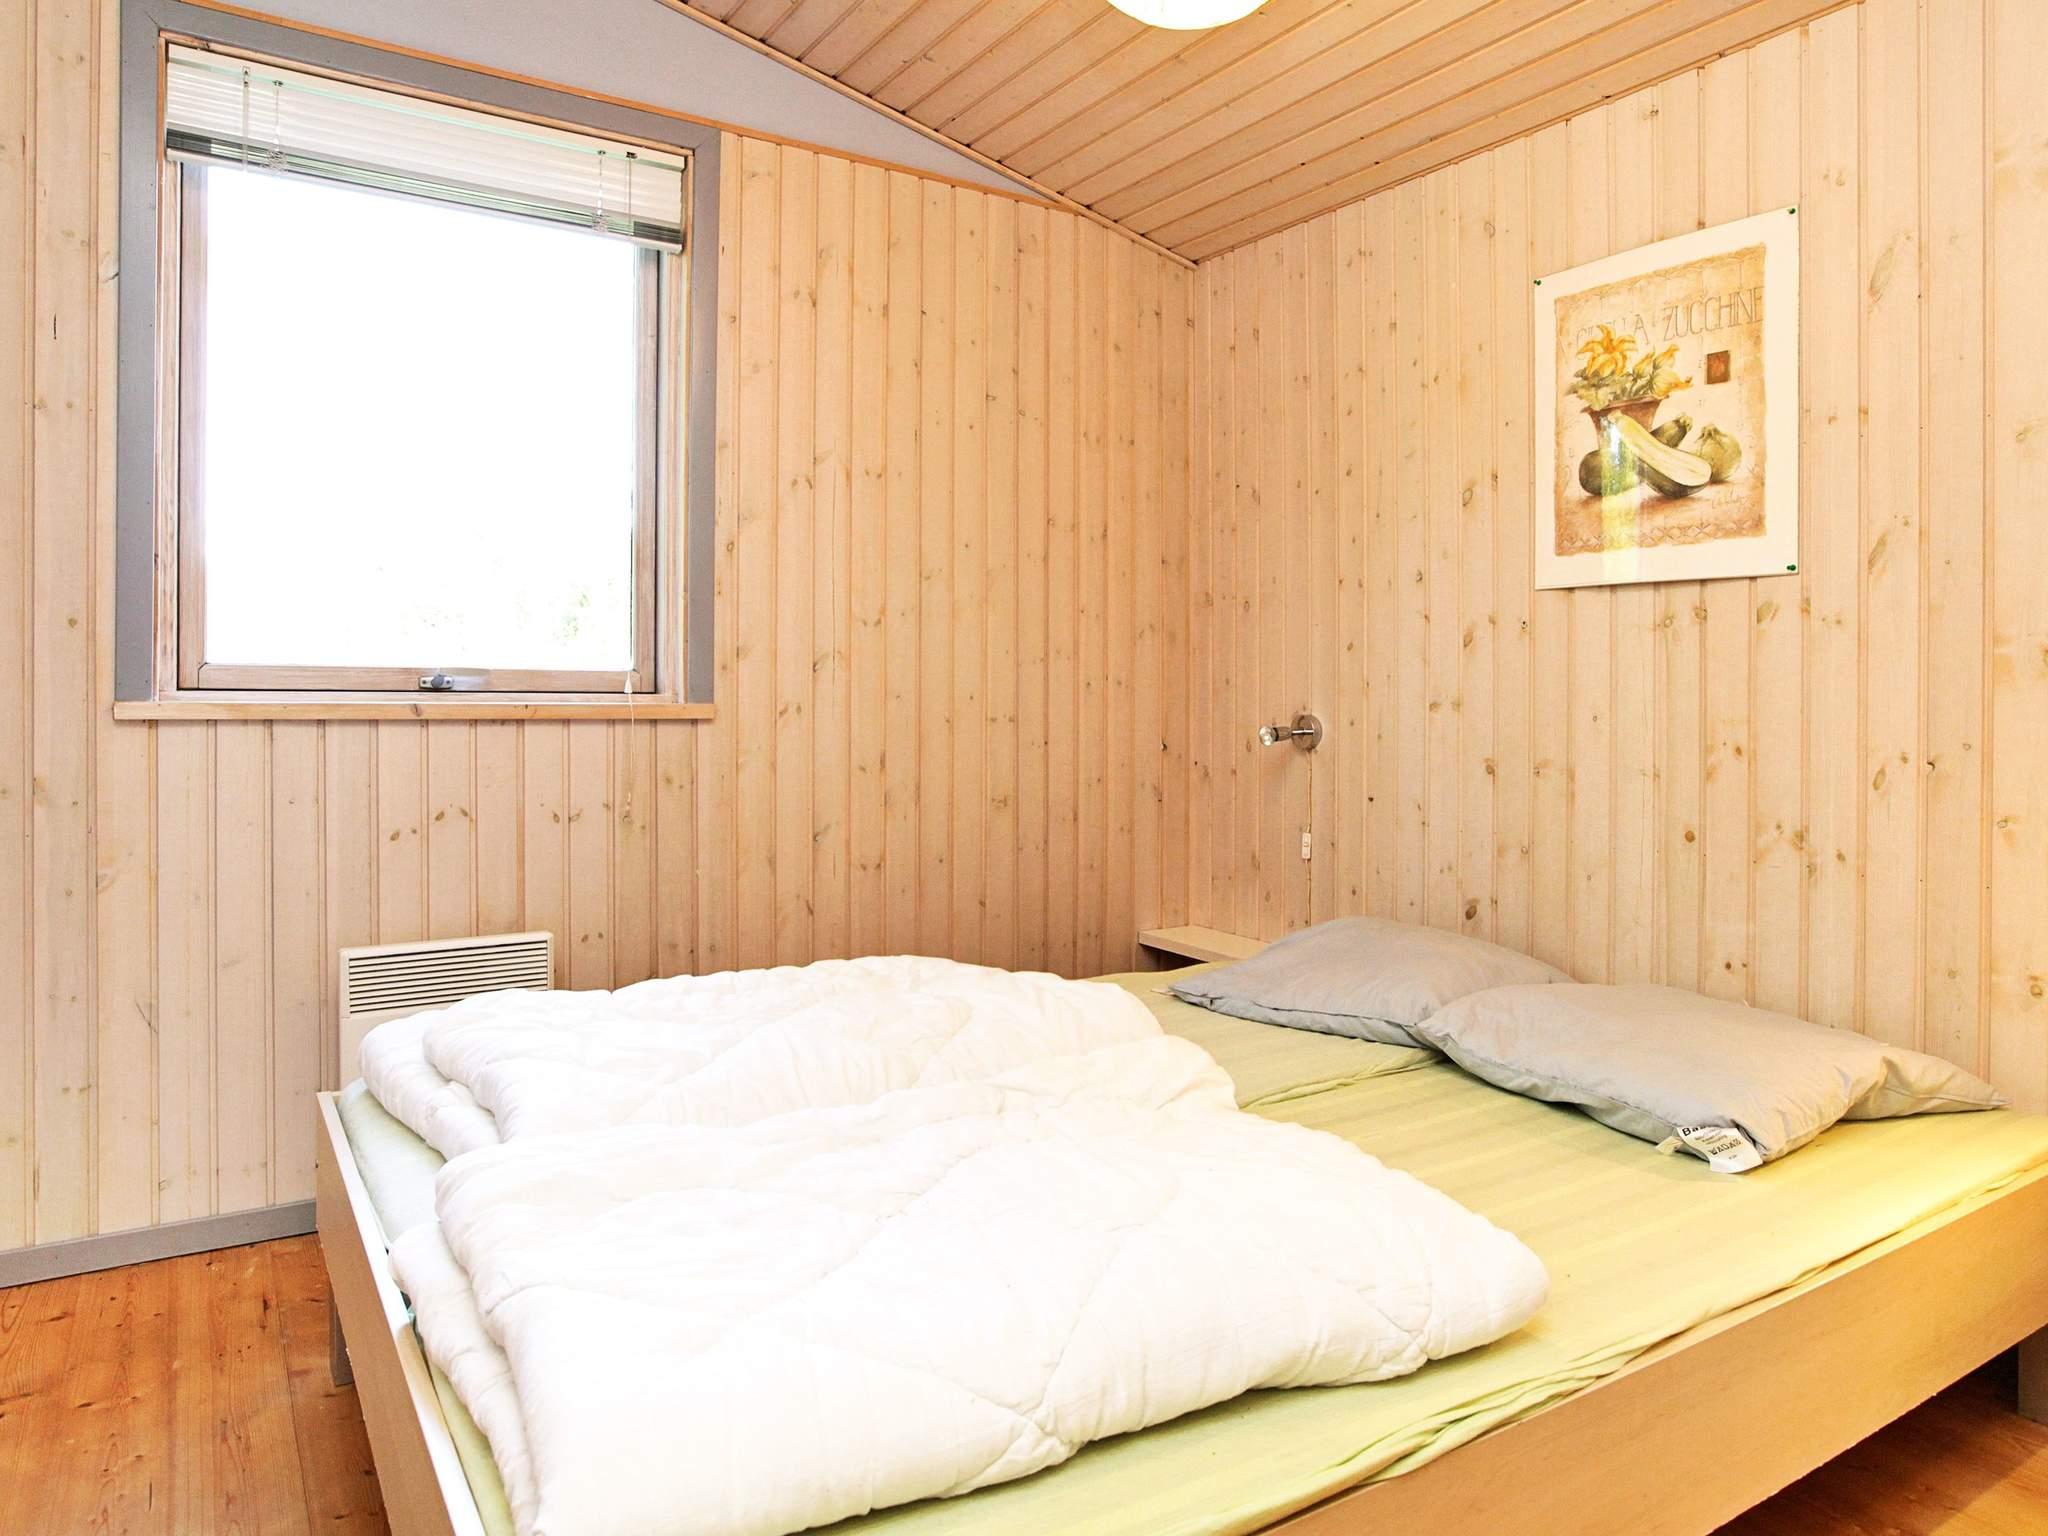 Ferienhaus Overby Lyng (93506), Nykøbing Sj, , Westseeland, Dänemark, Bild 17